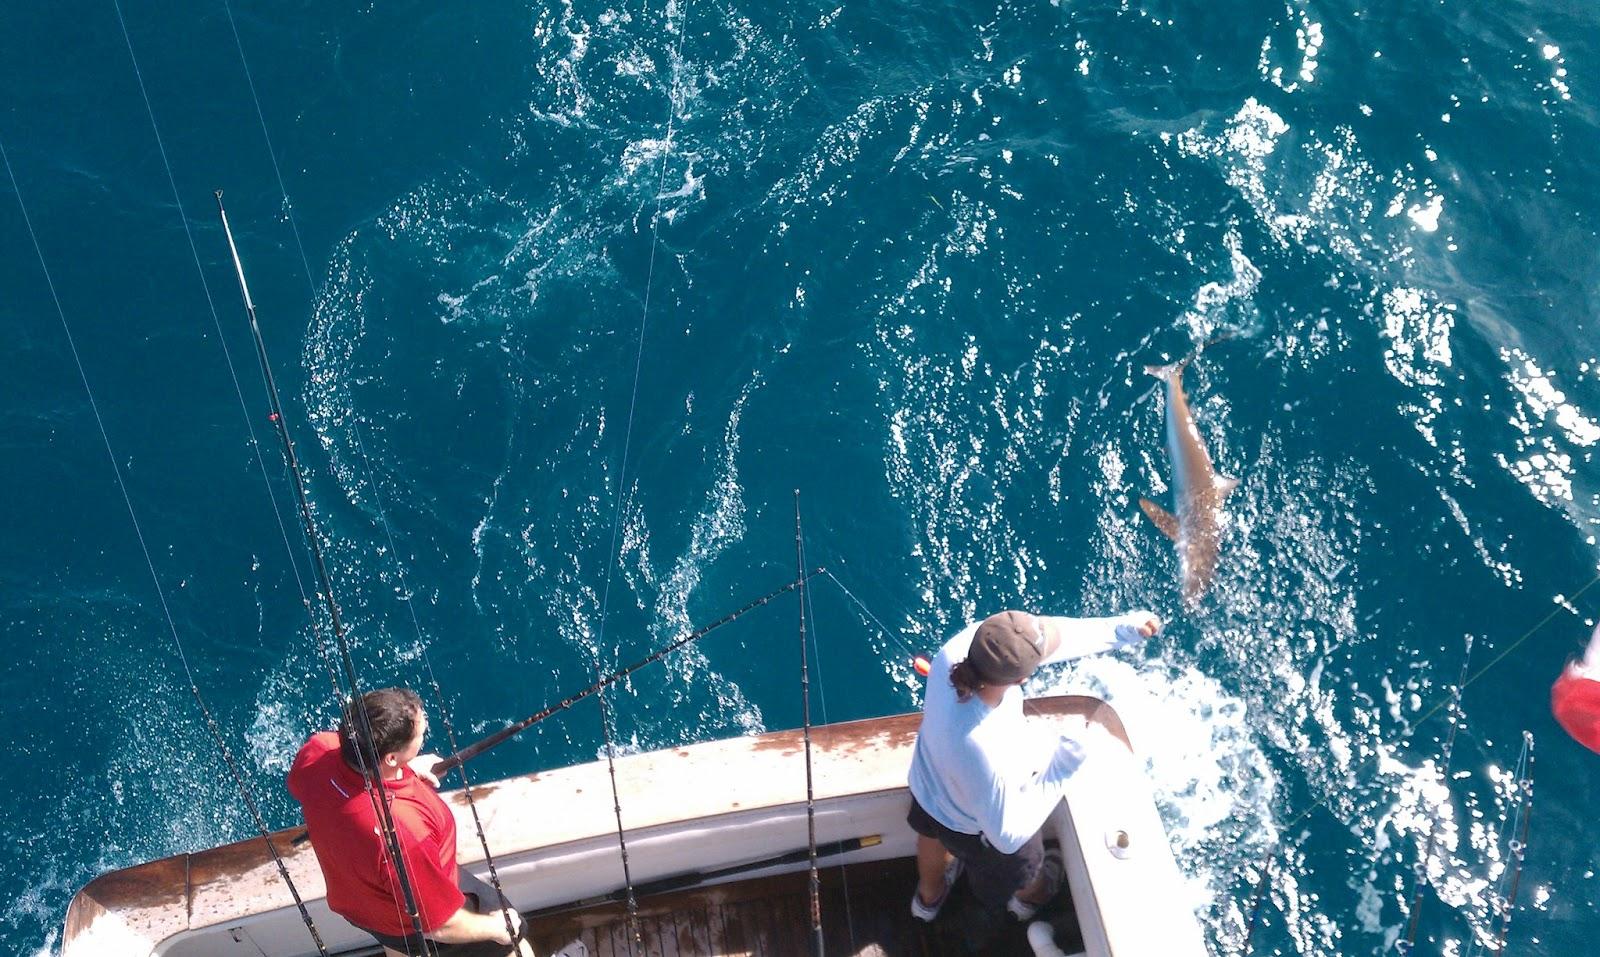 Miami fishing blog preferable place of fishing in miami for Fishing in miami